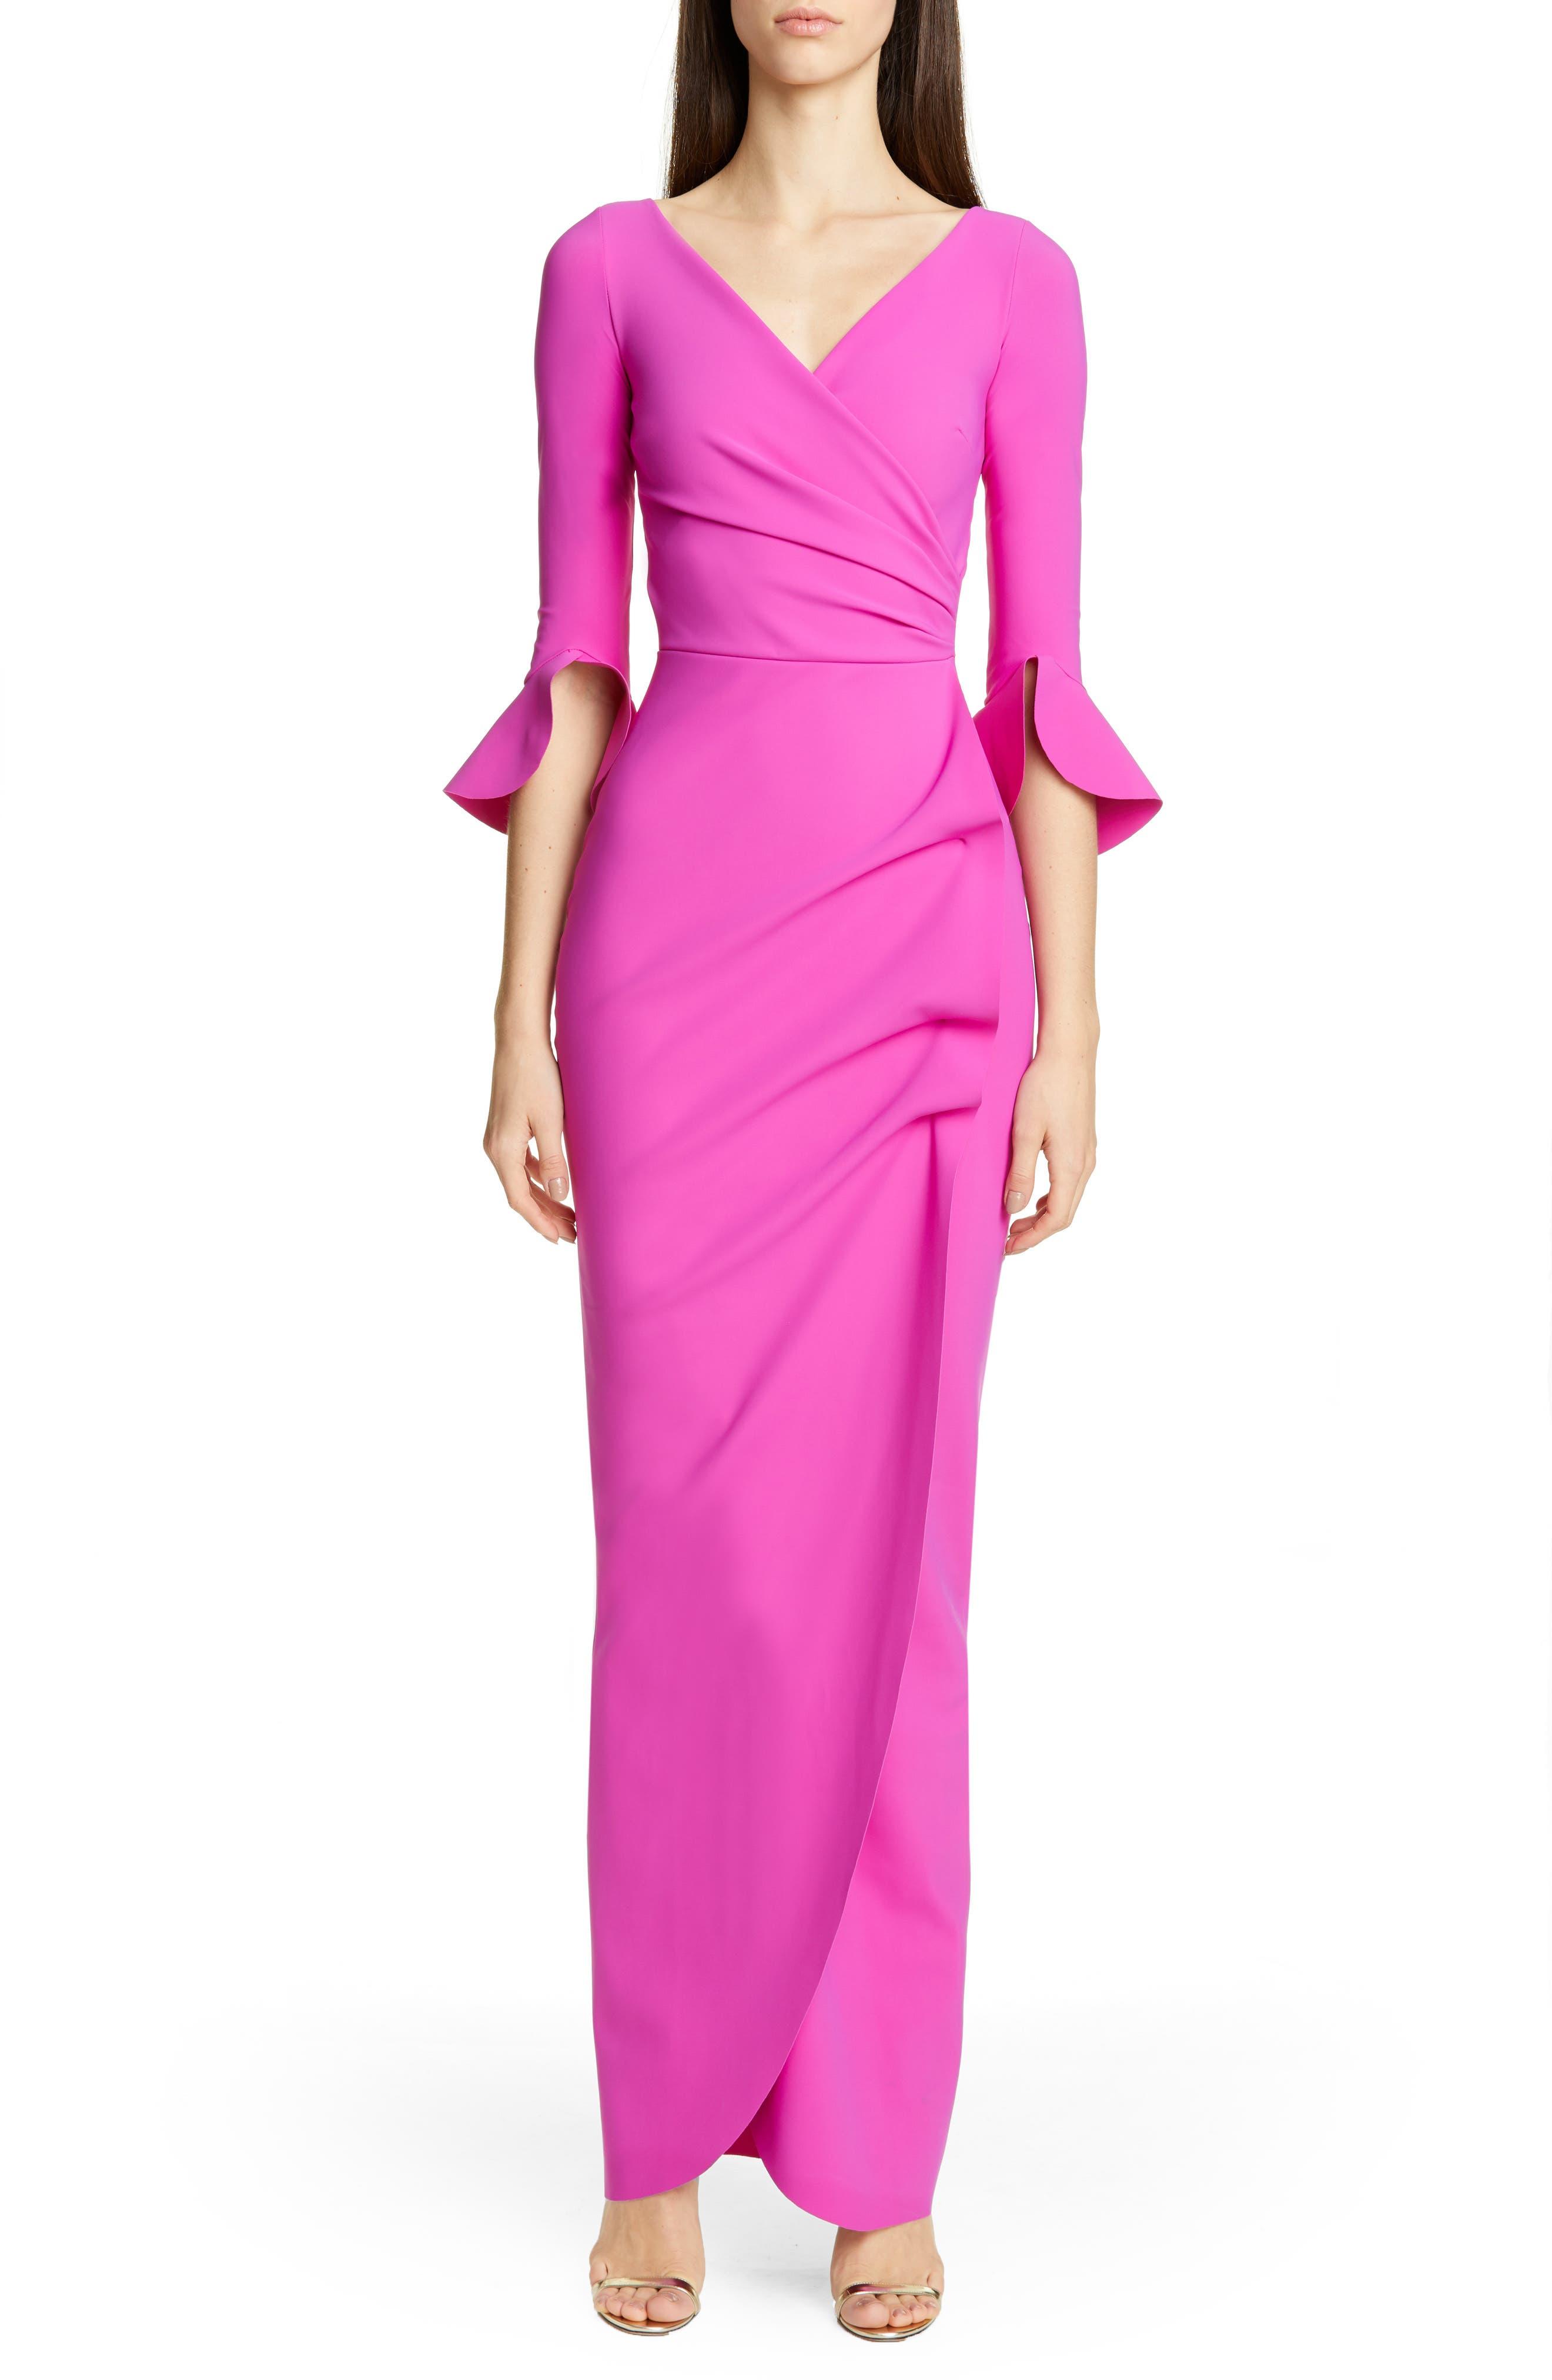 Chiara Boni La Petite Robe Ruched Bell Sleeve Evening Dress, 6 IT - Purple